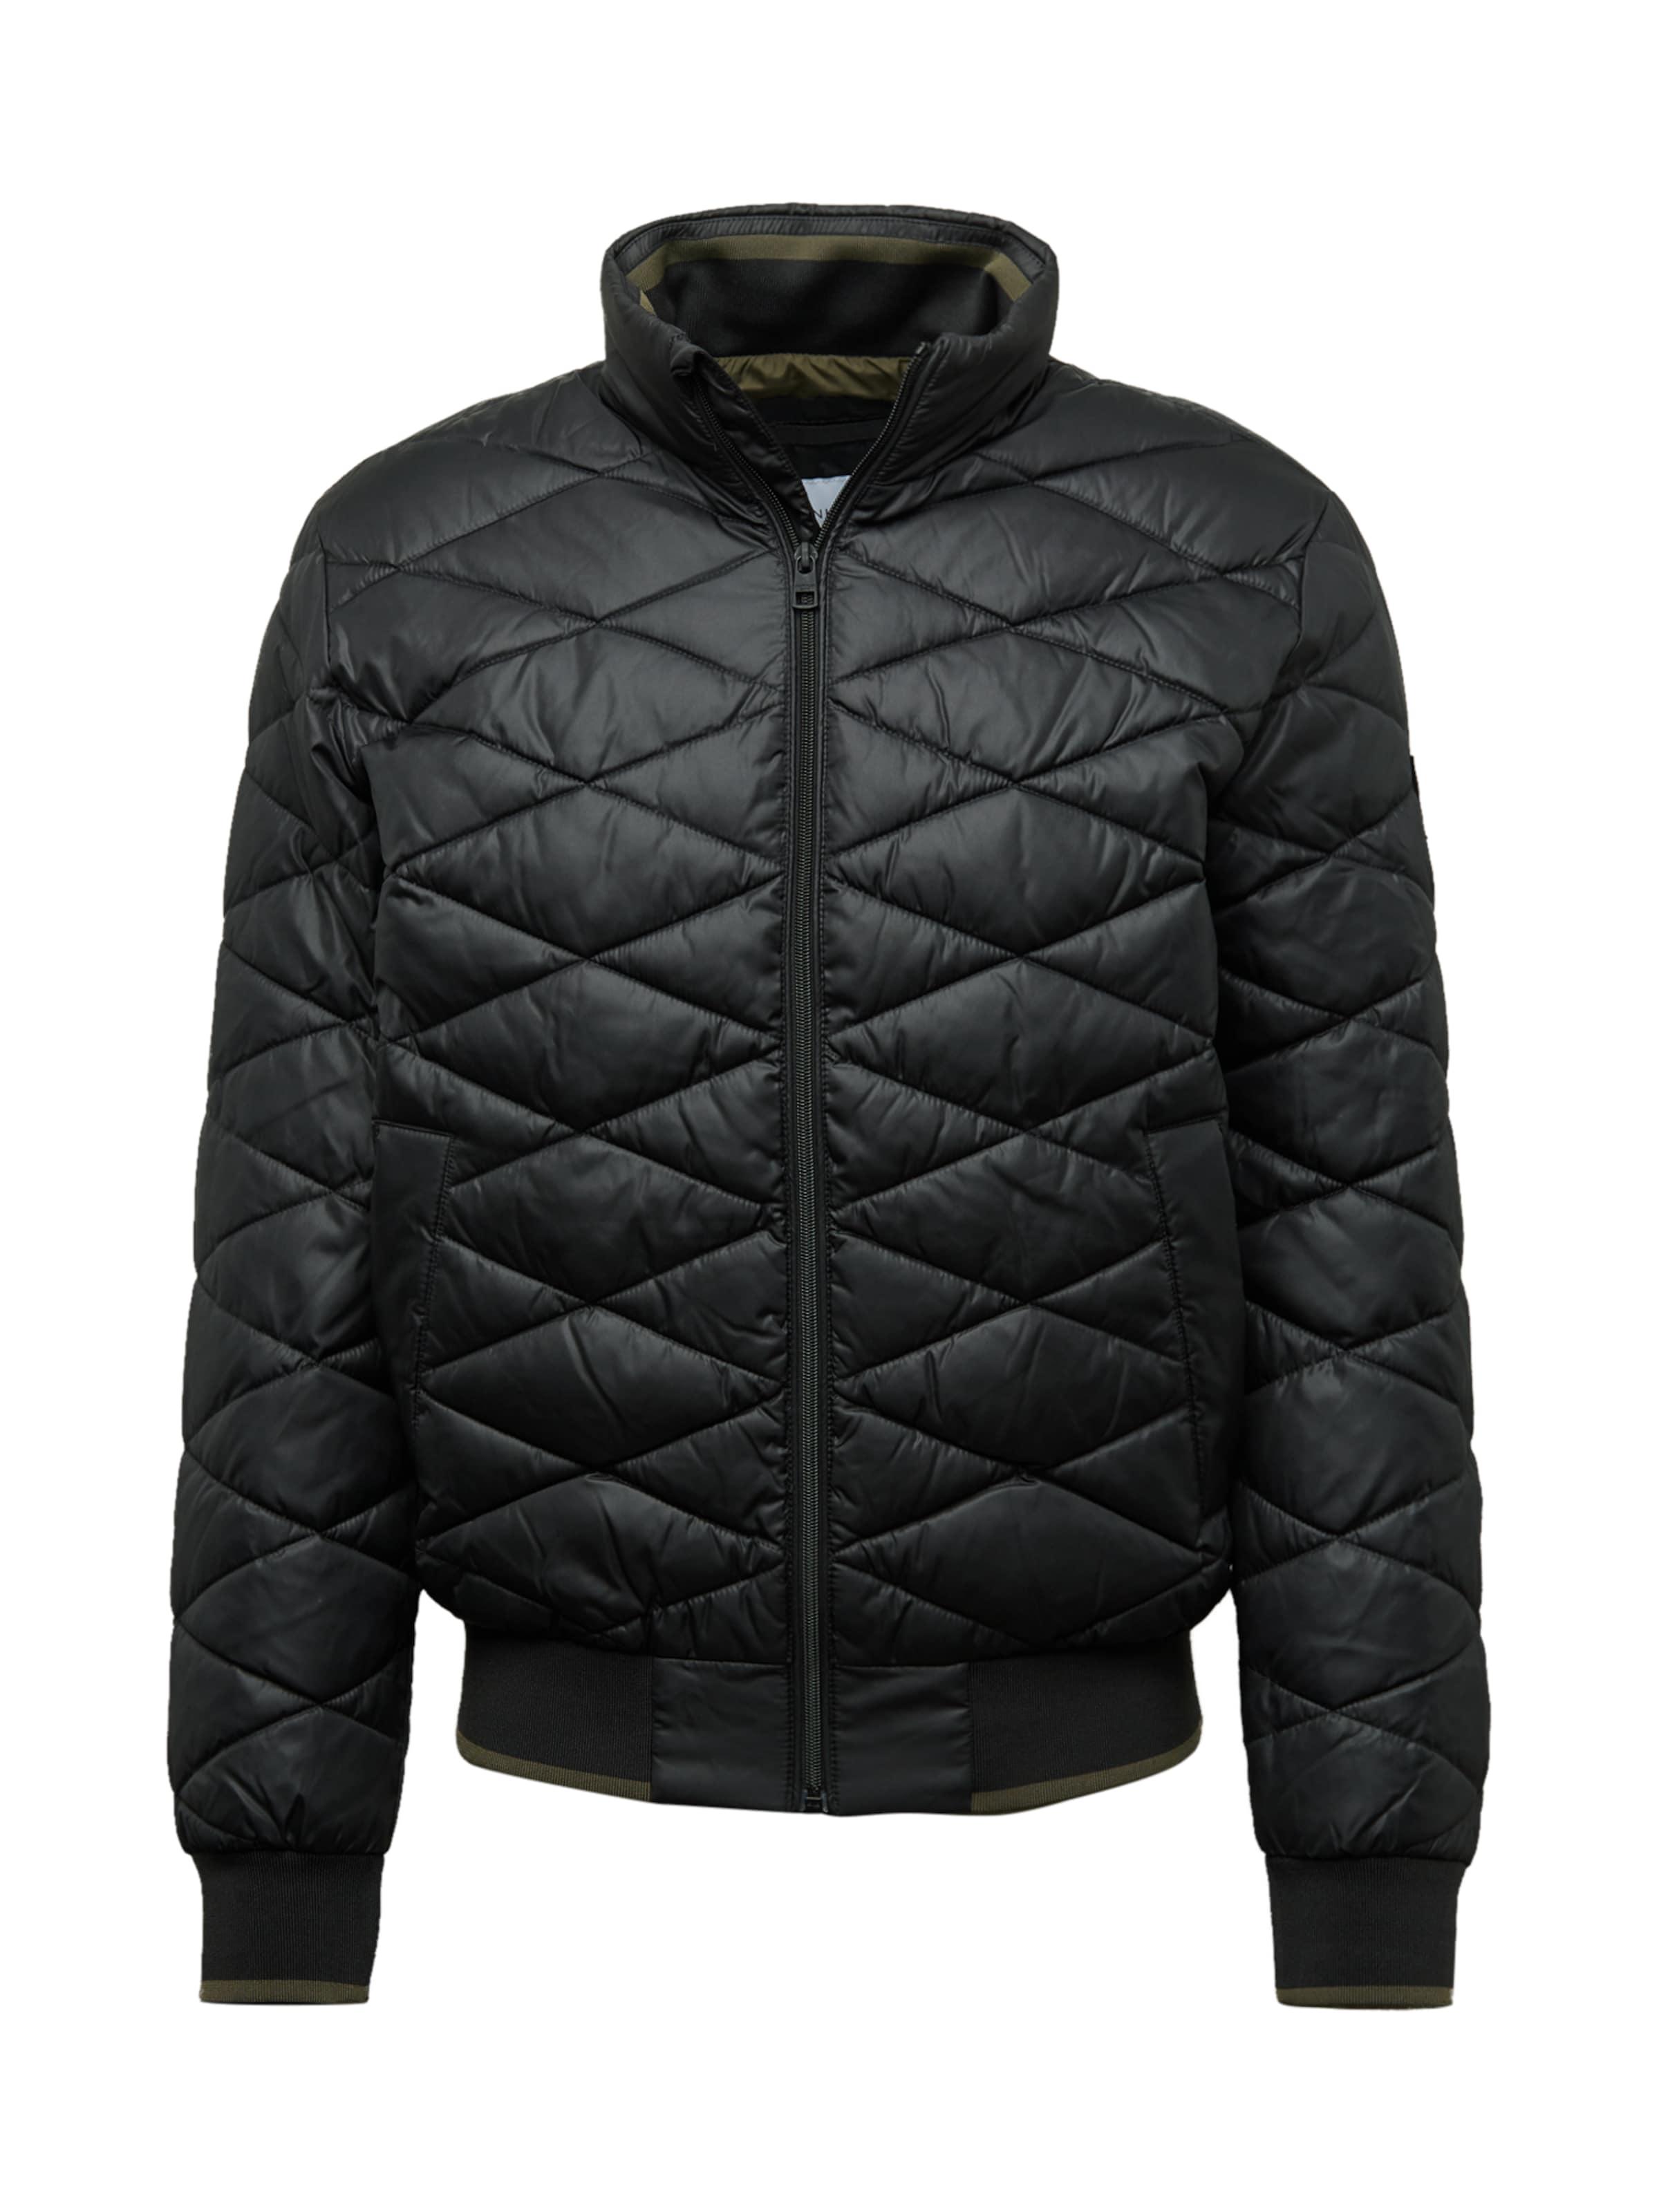 Calvin Stand Schwarz Klein Jeans Up Collar Jacket' Jacke In 'uilted wvmnONy80